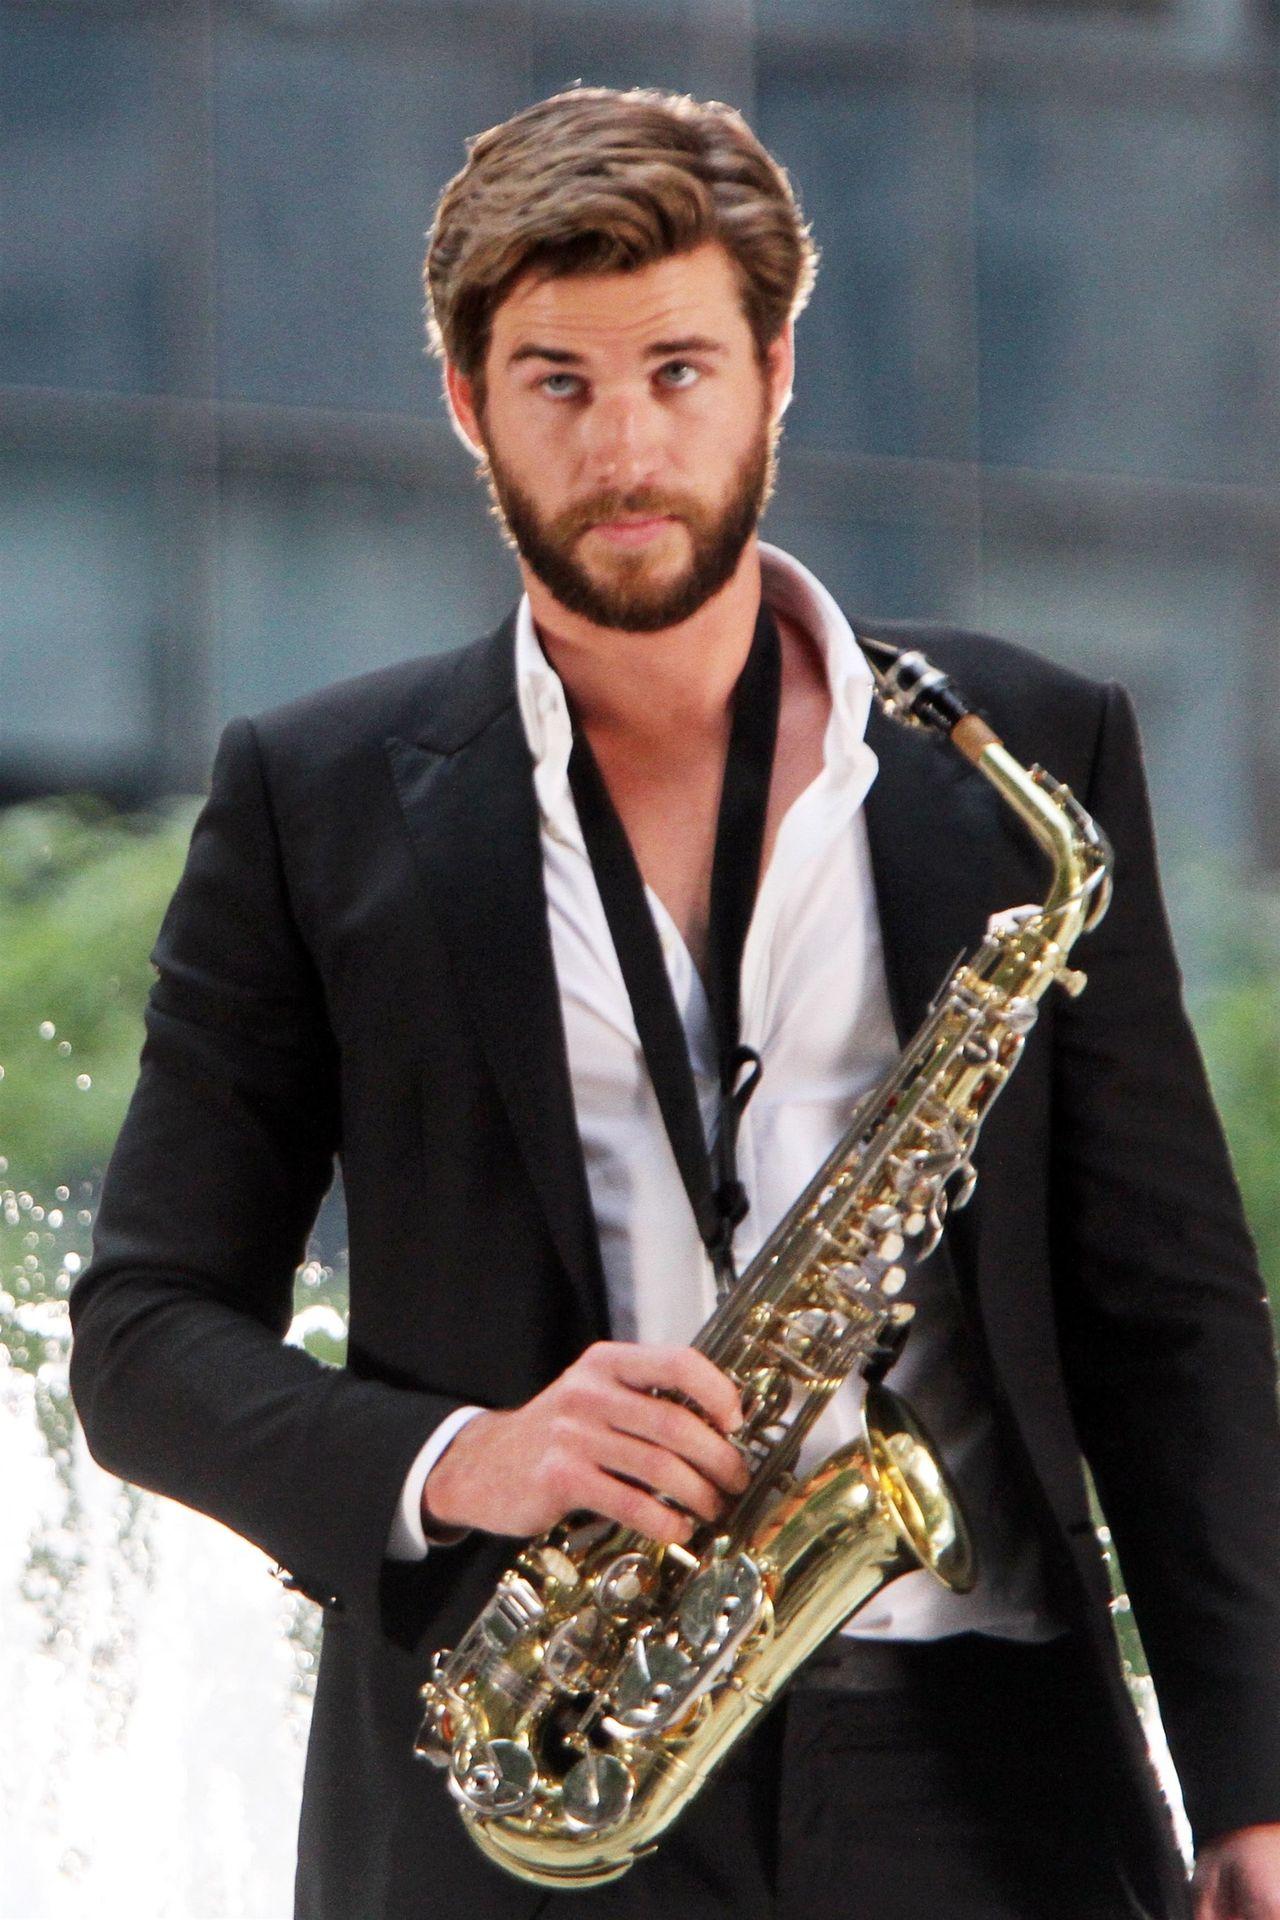 Miley Cyrus i Liam Hemsworth planują ślub?!